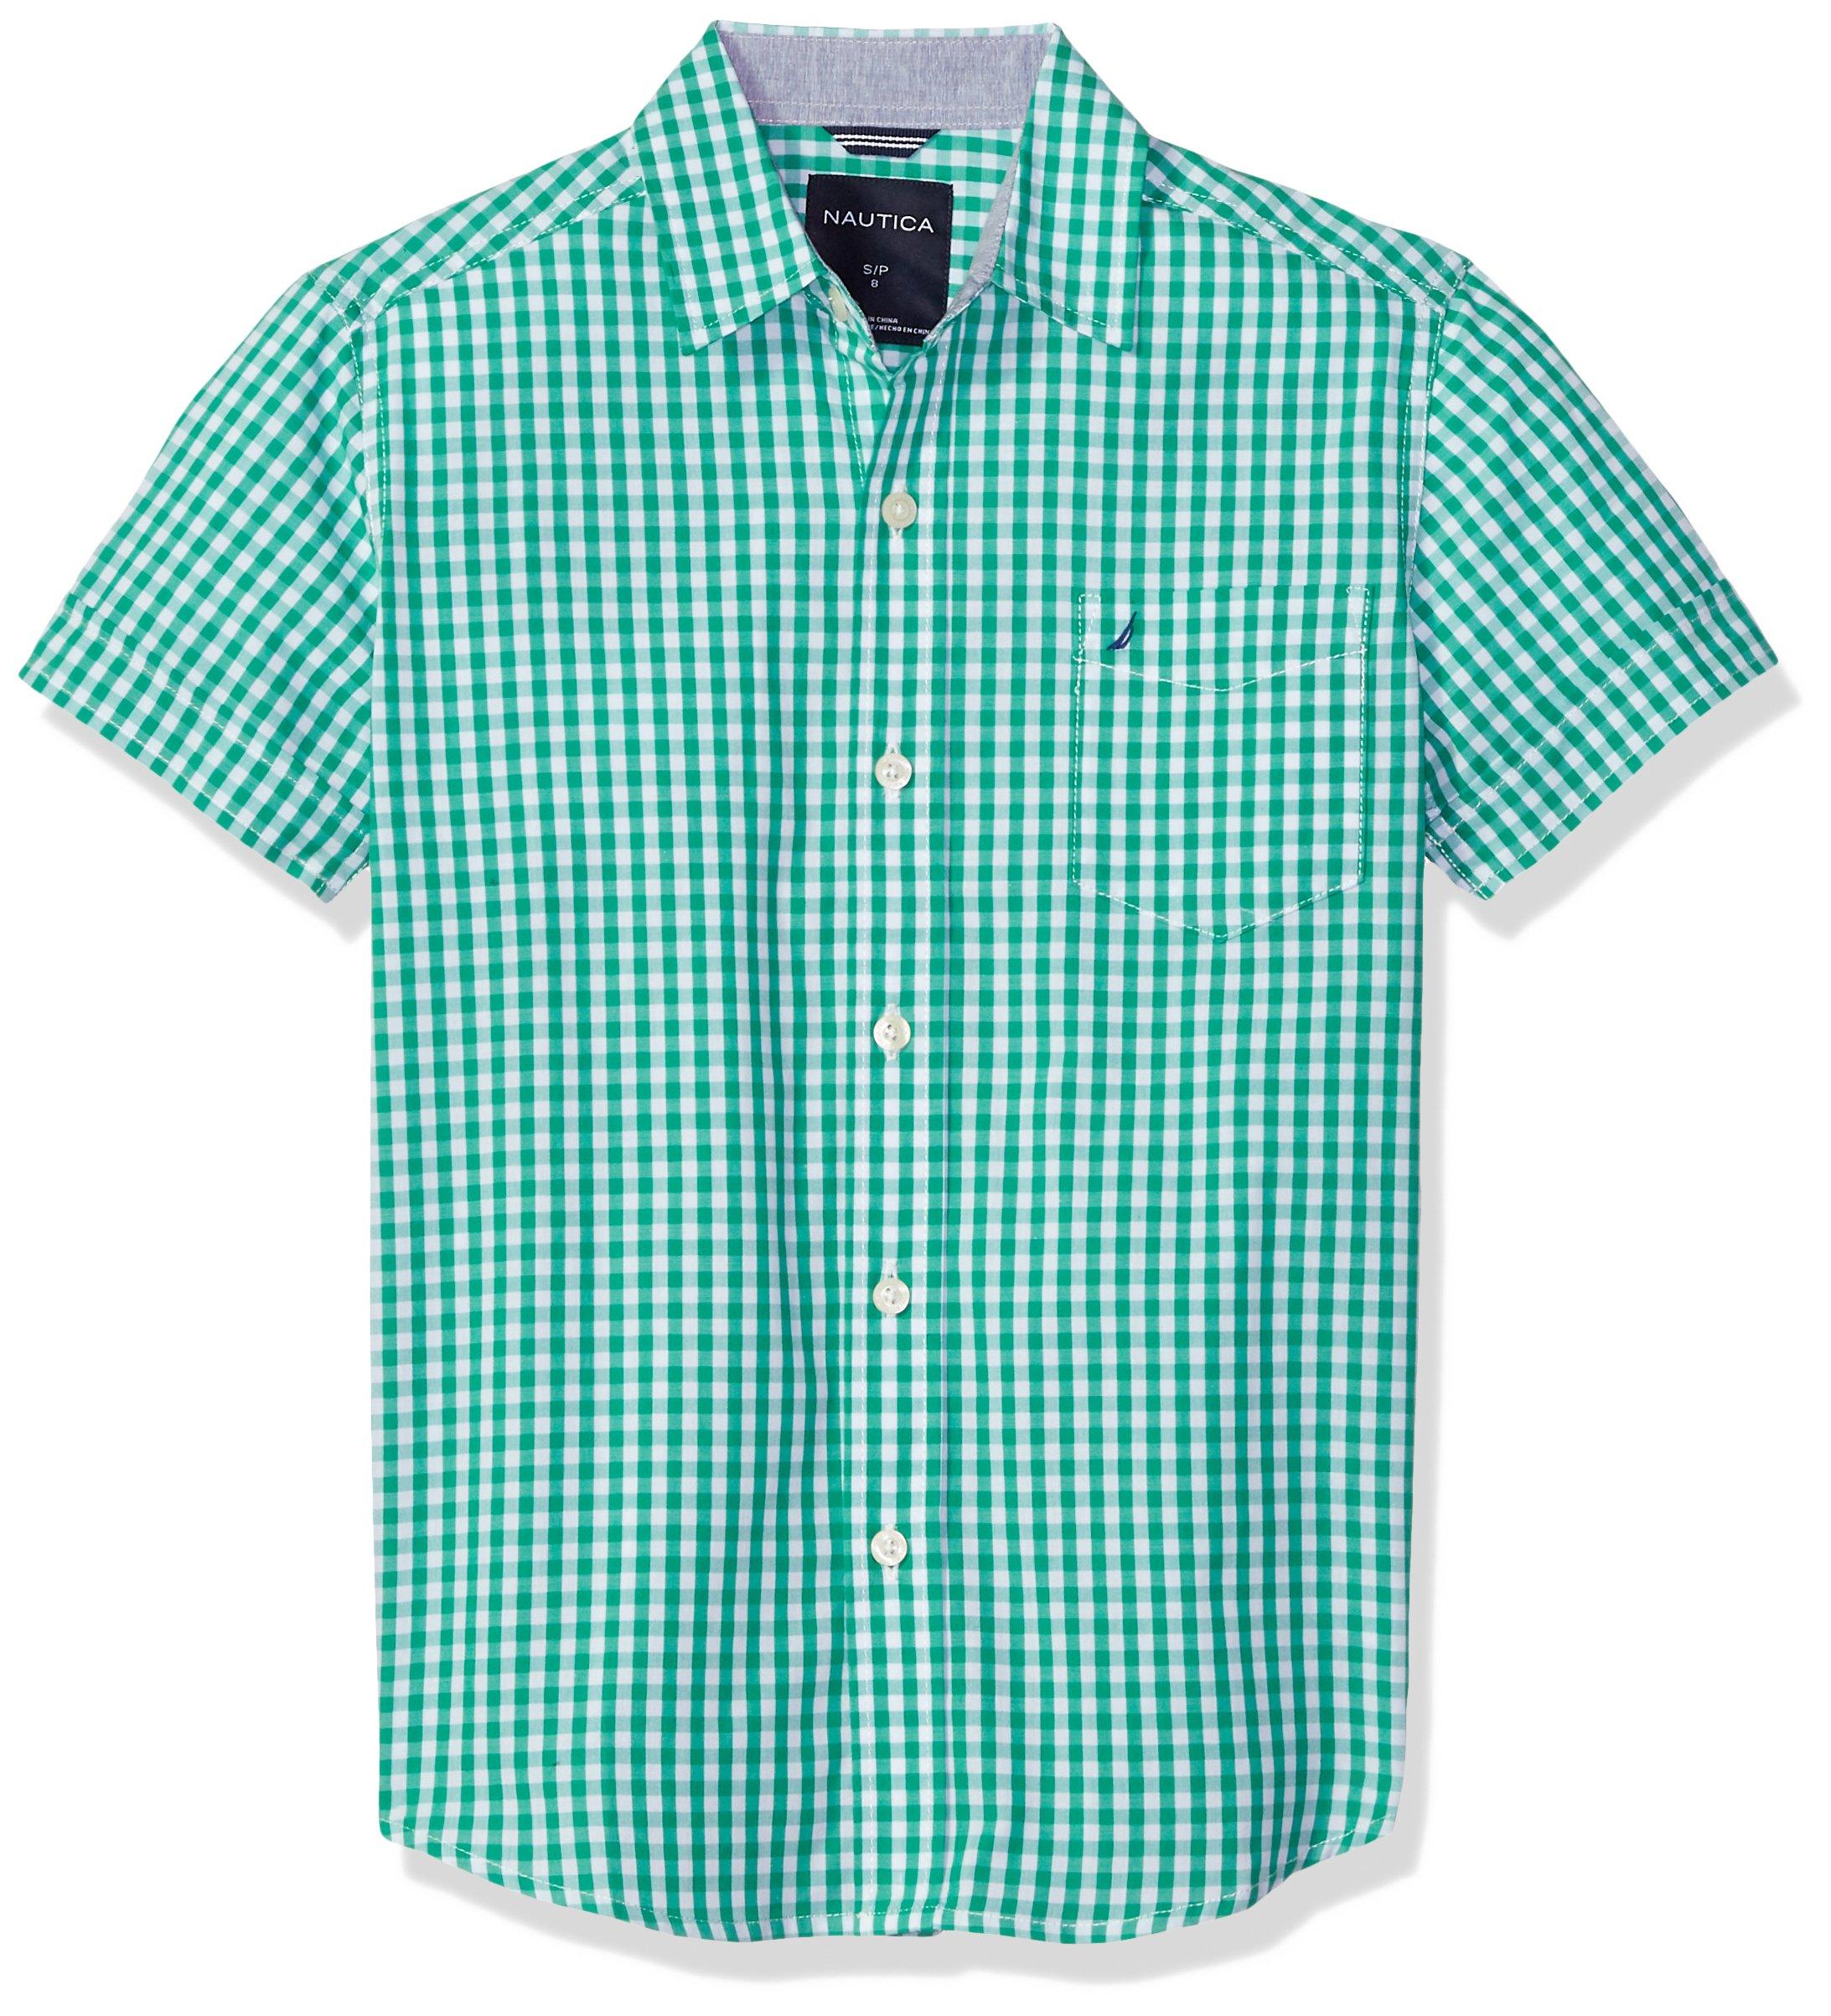 Nautica Boys' Big Short Sleeve Gingham Woven Shirt, Samuel Golf Green, Large (14/16)